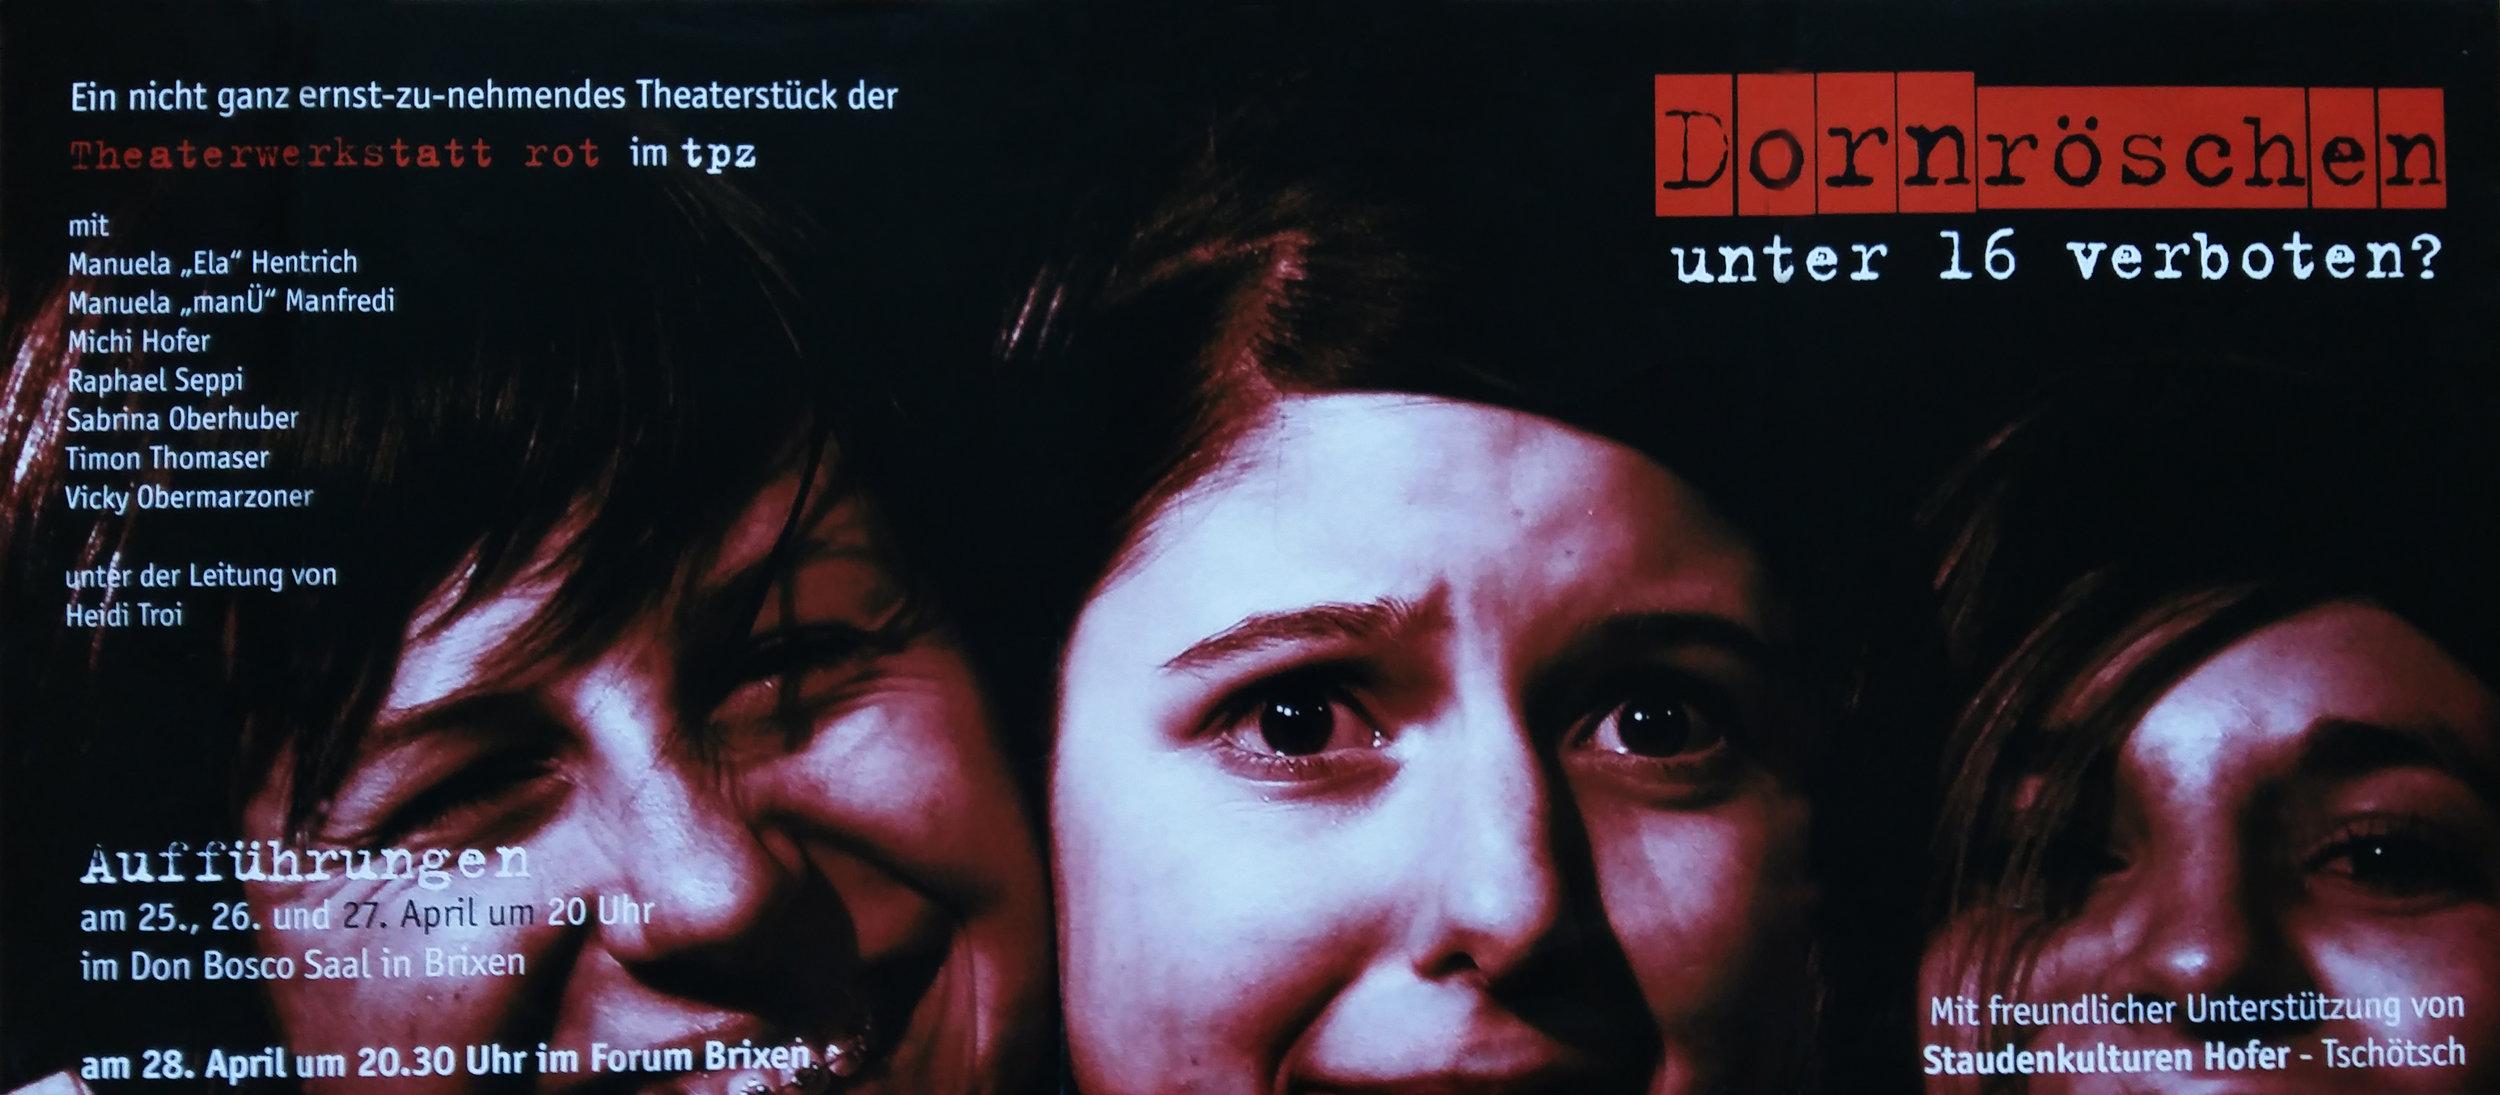 2004 rot Dornröschen unter 16 verboten Plakat.jpg